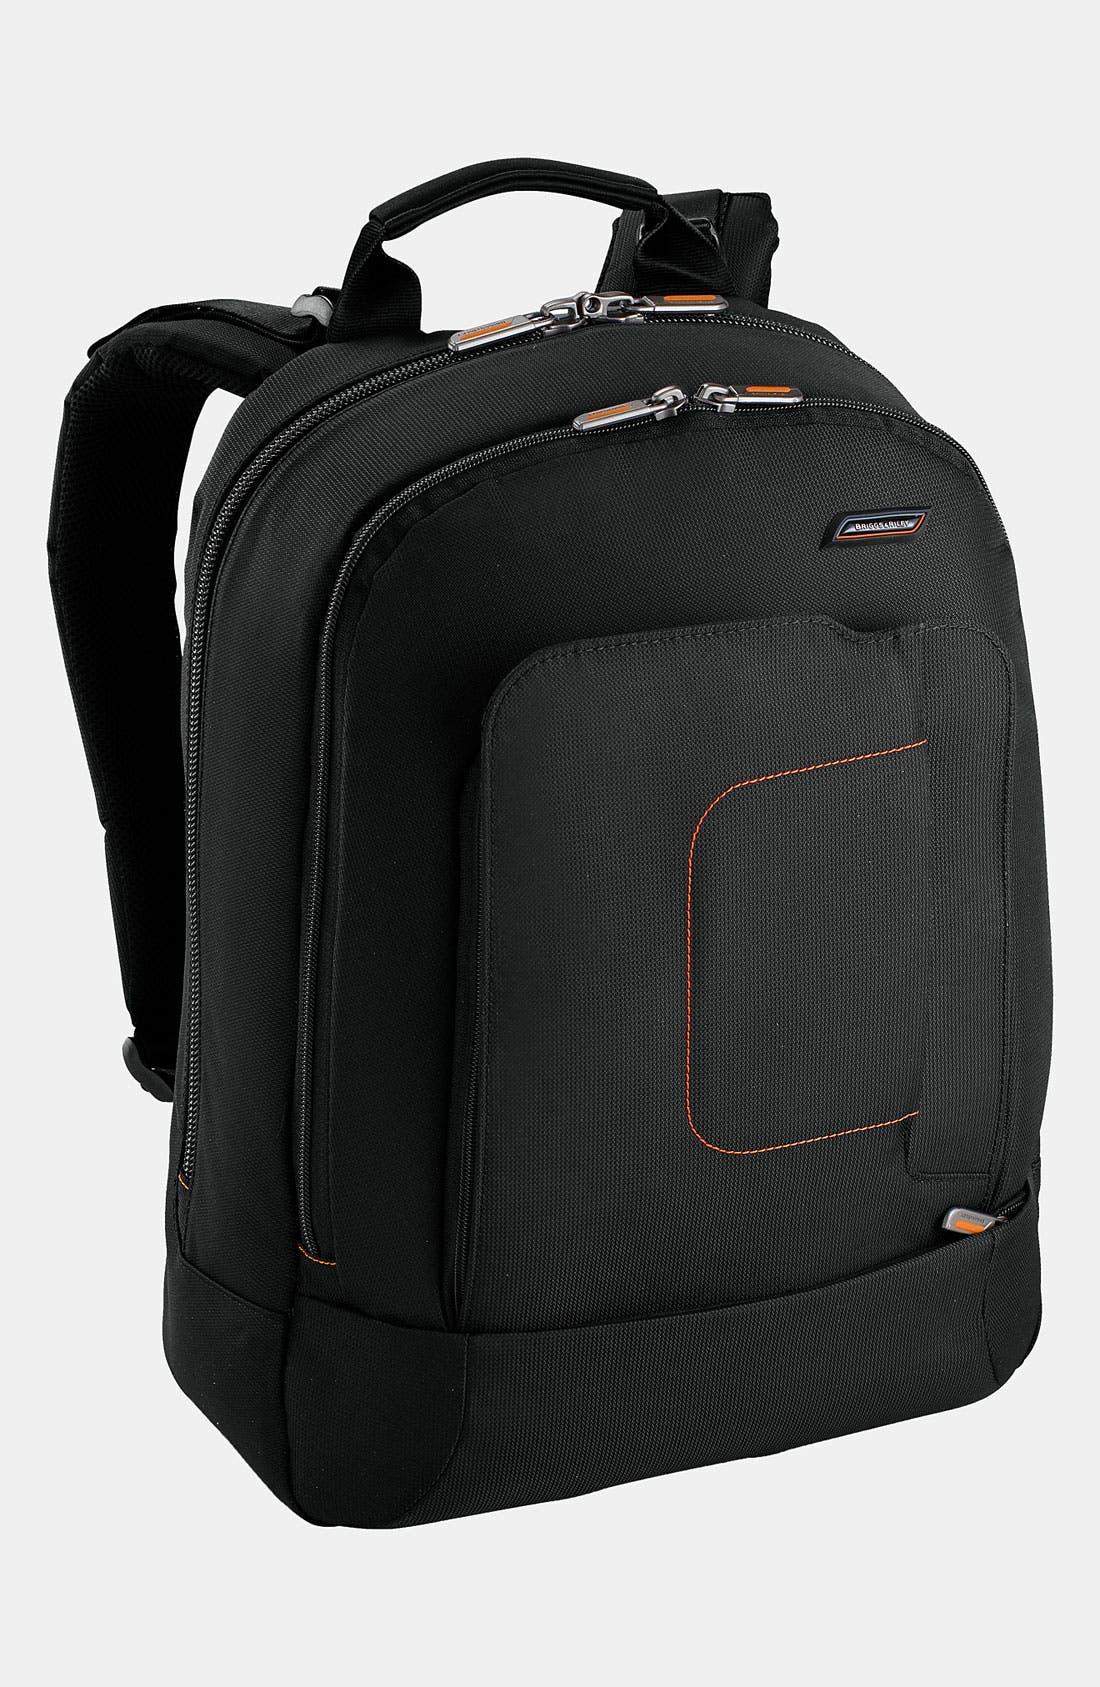 Main Image - Briggs & Riley 'Verb - Glide' Backpack